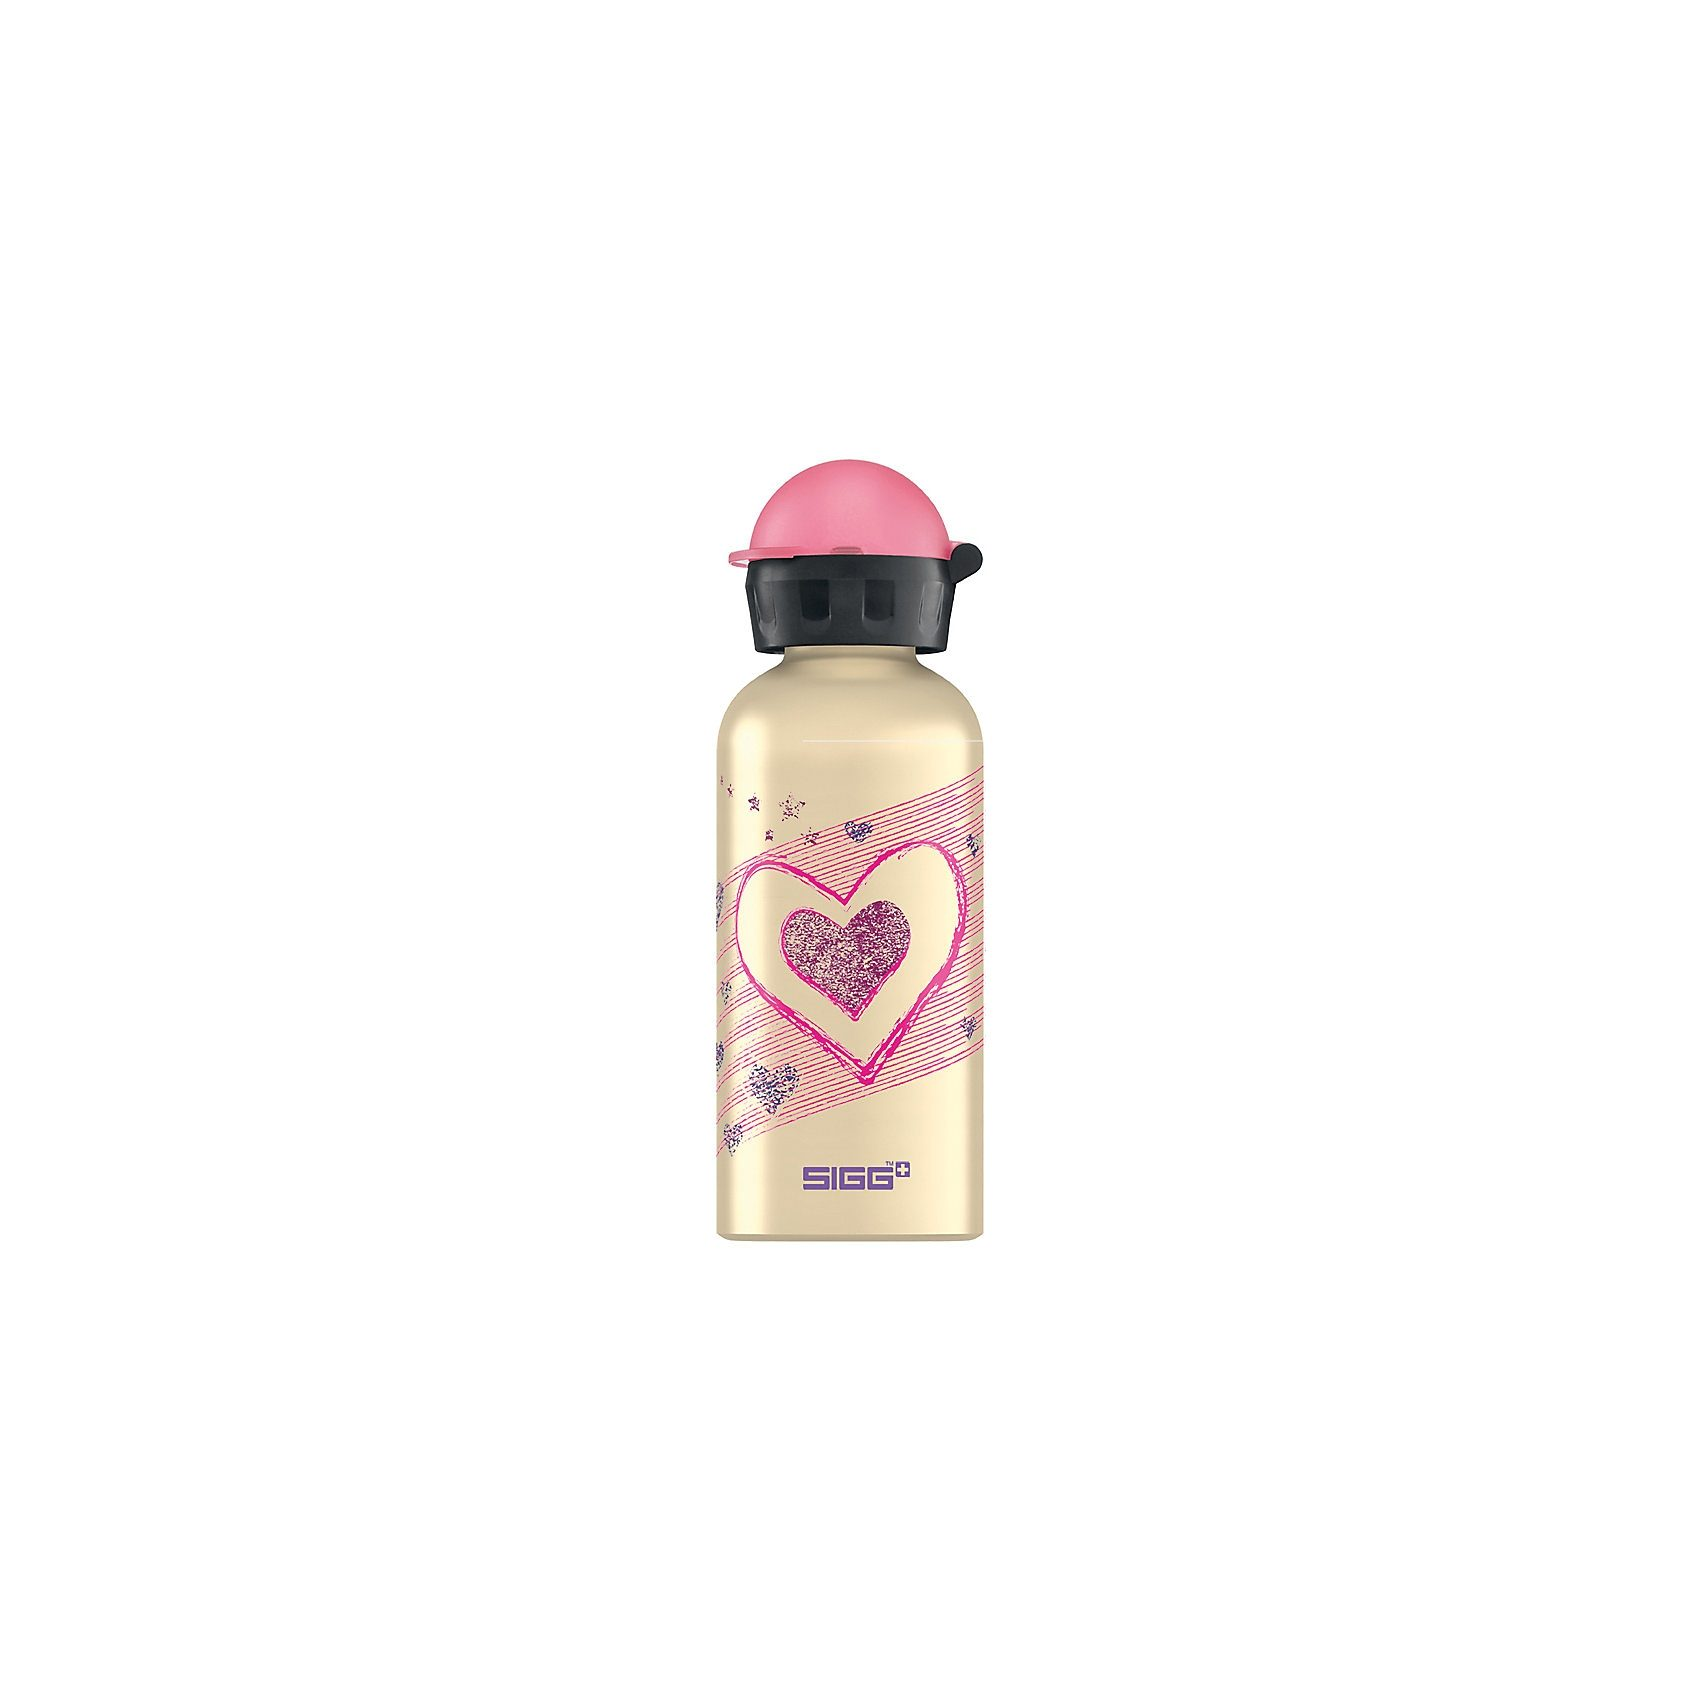 SIGG Alu-Trinkflasche Hearts & Stars, 400 ml